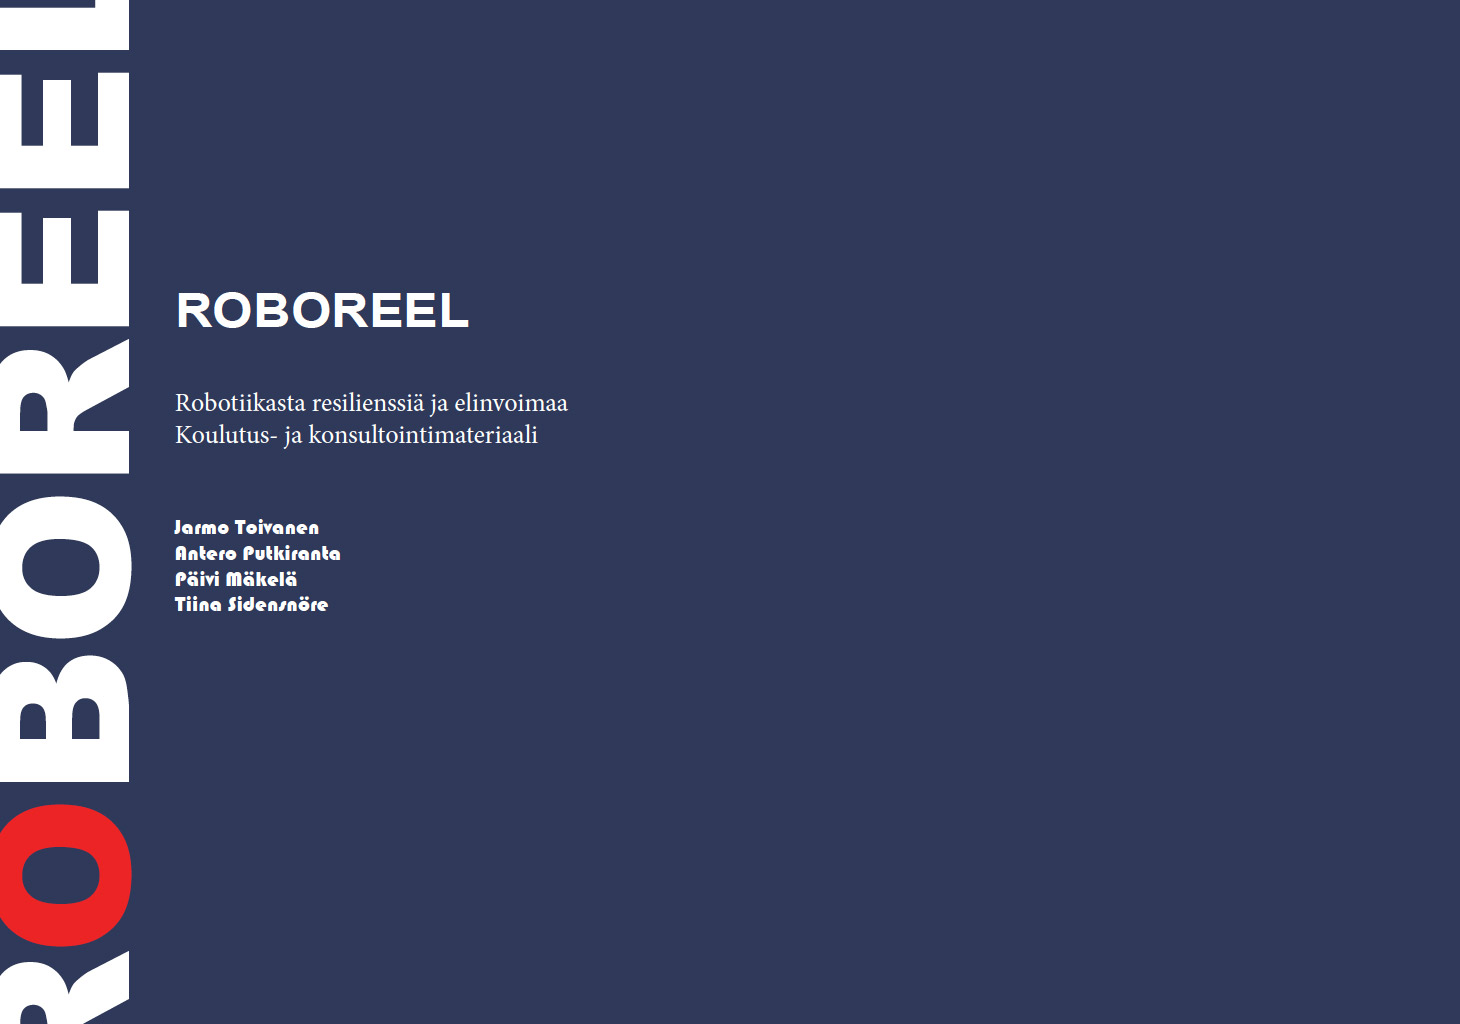 Cover for article 'ROBOREEL koulutus- ja konsultointimateriaali'